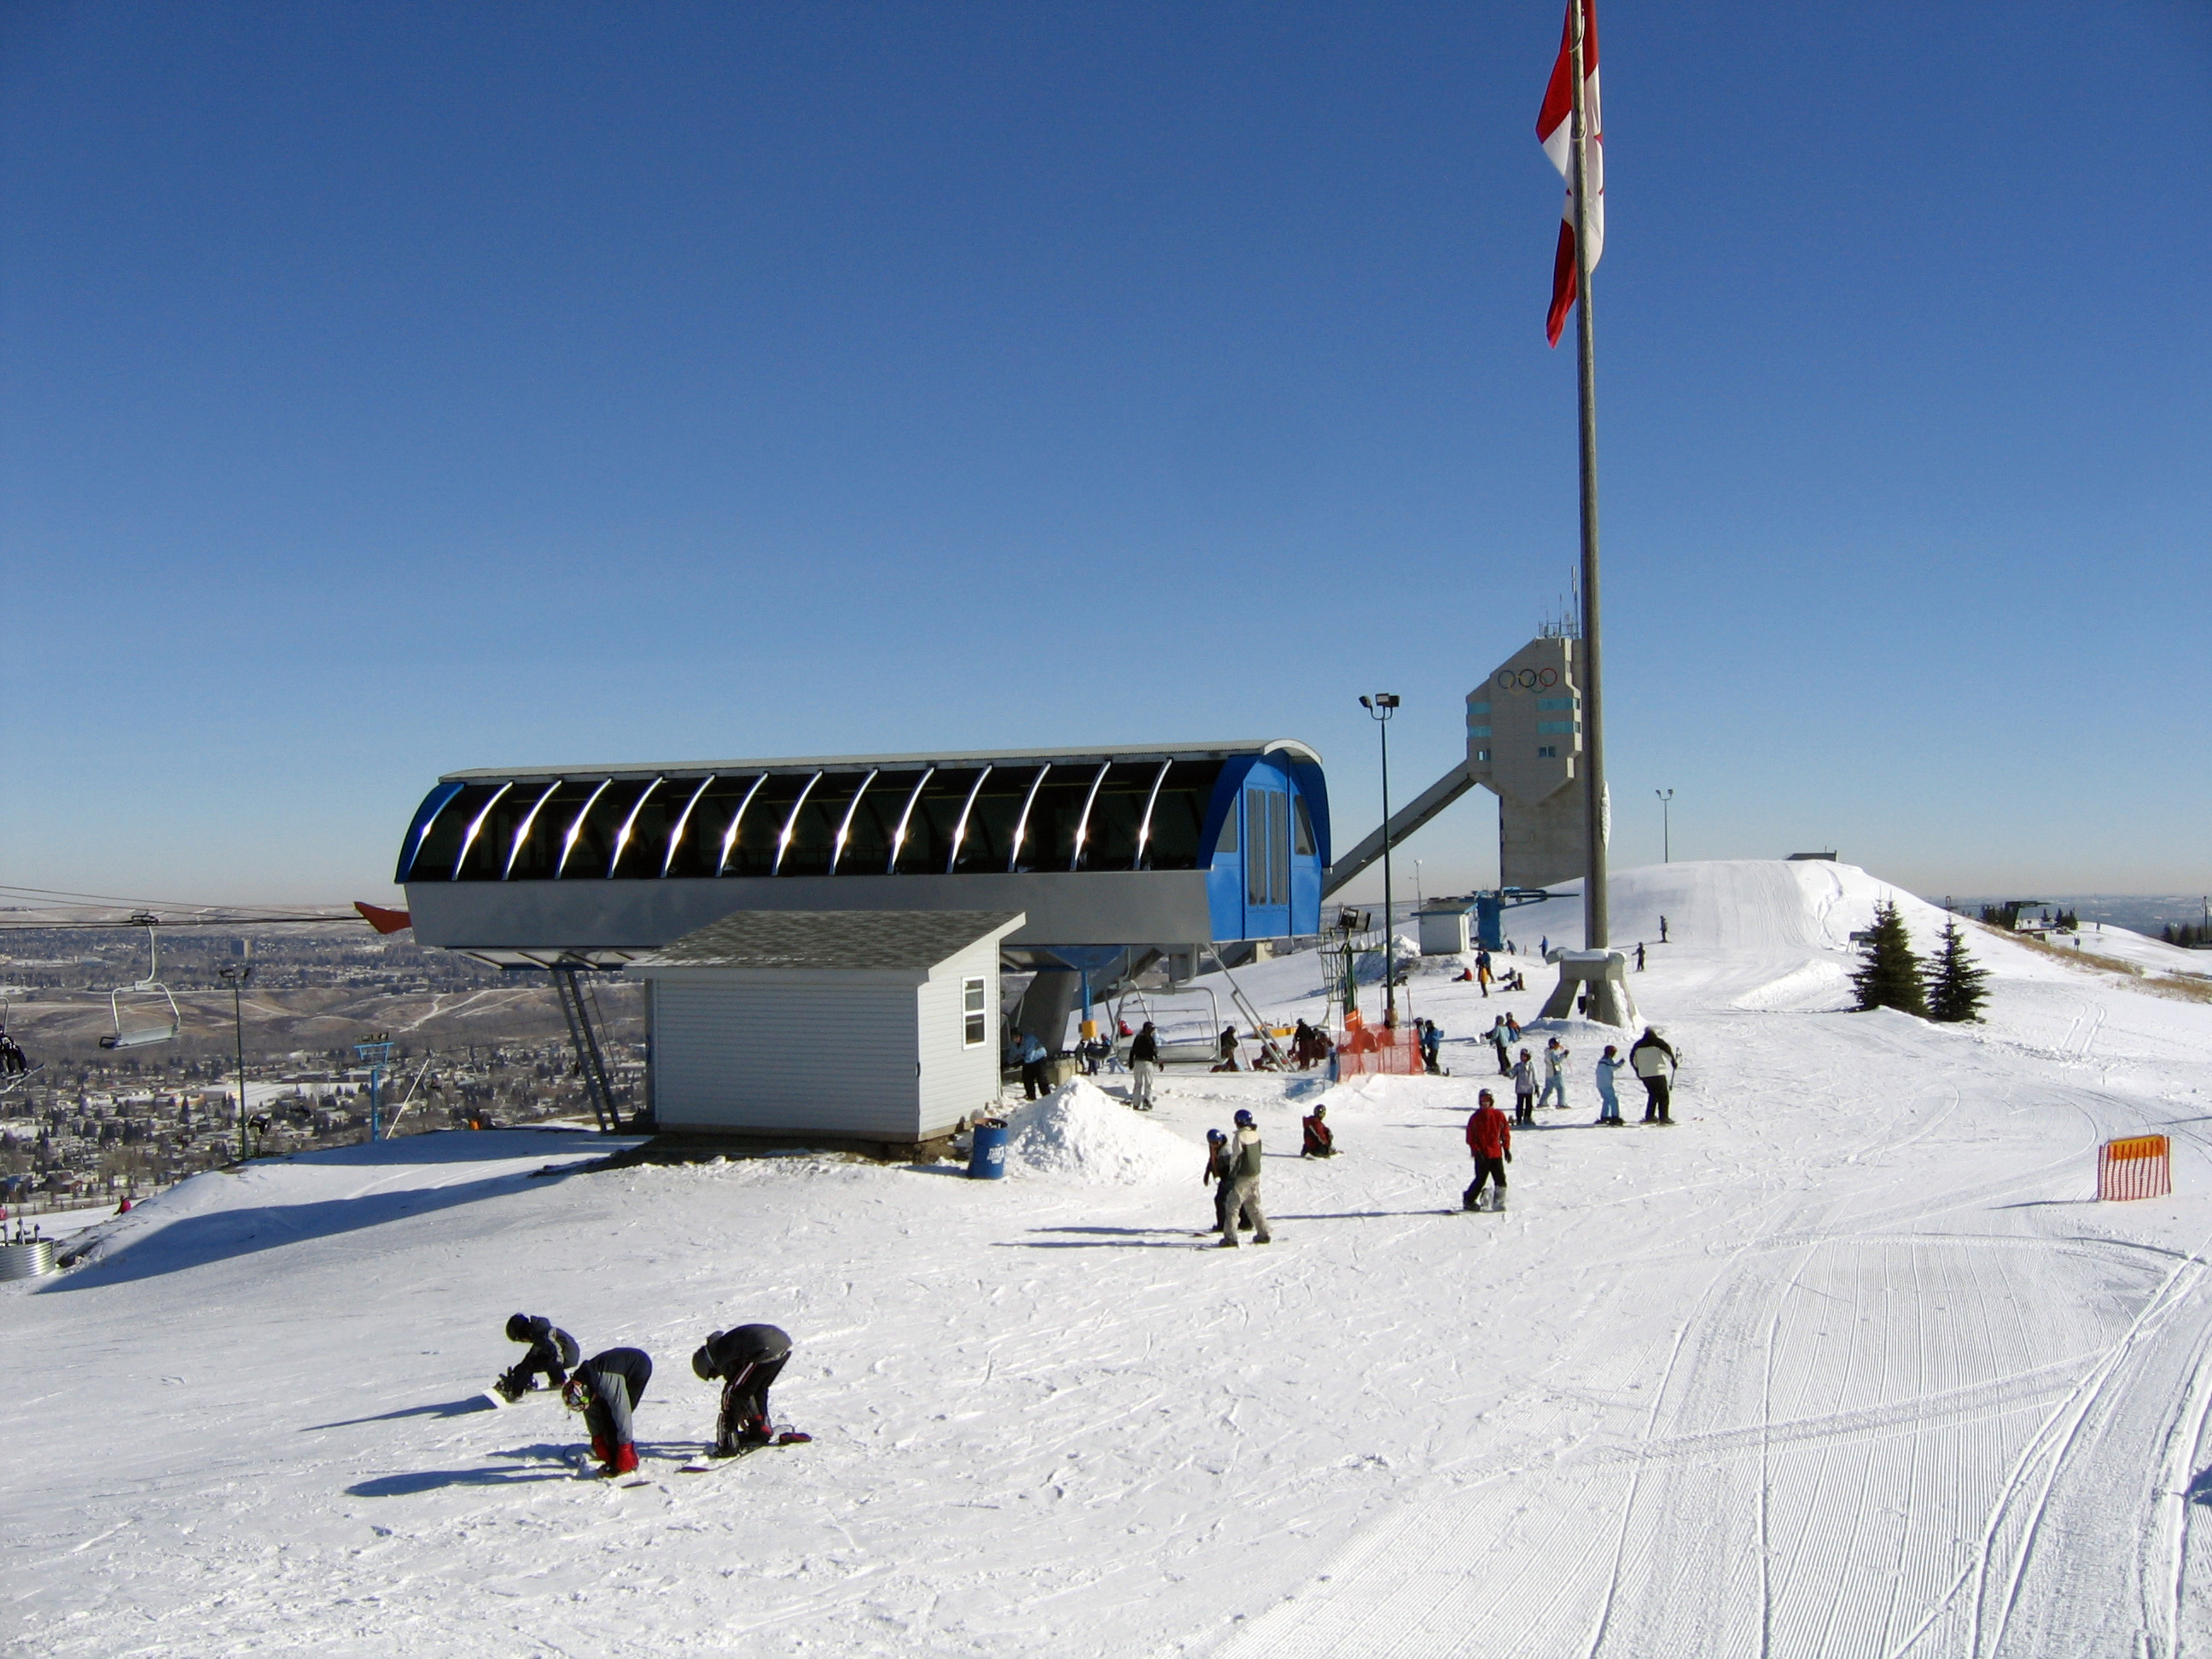 olympic park calgary, Things to do in Calgary, Canada